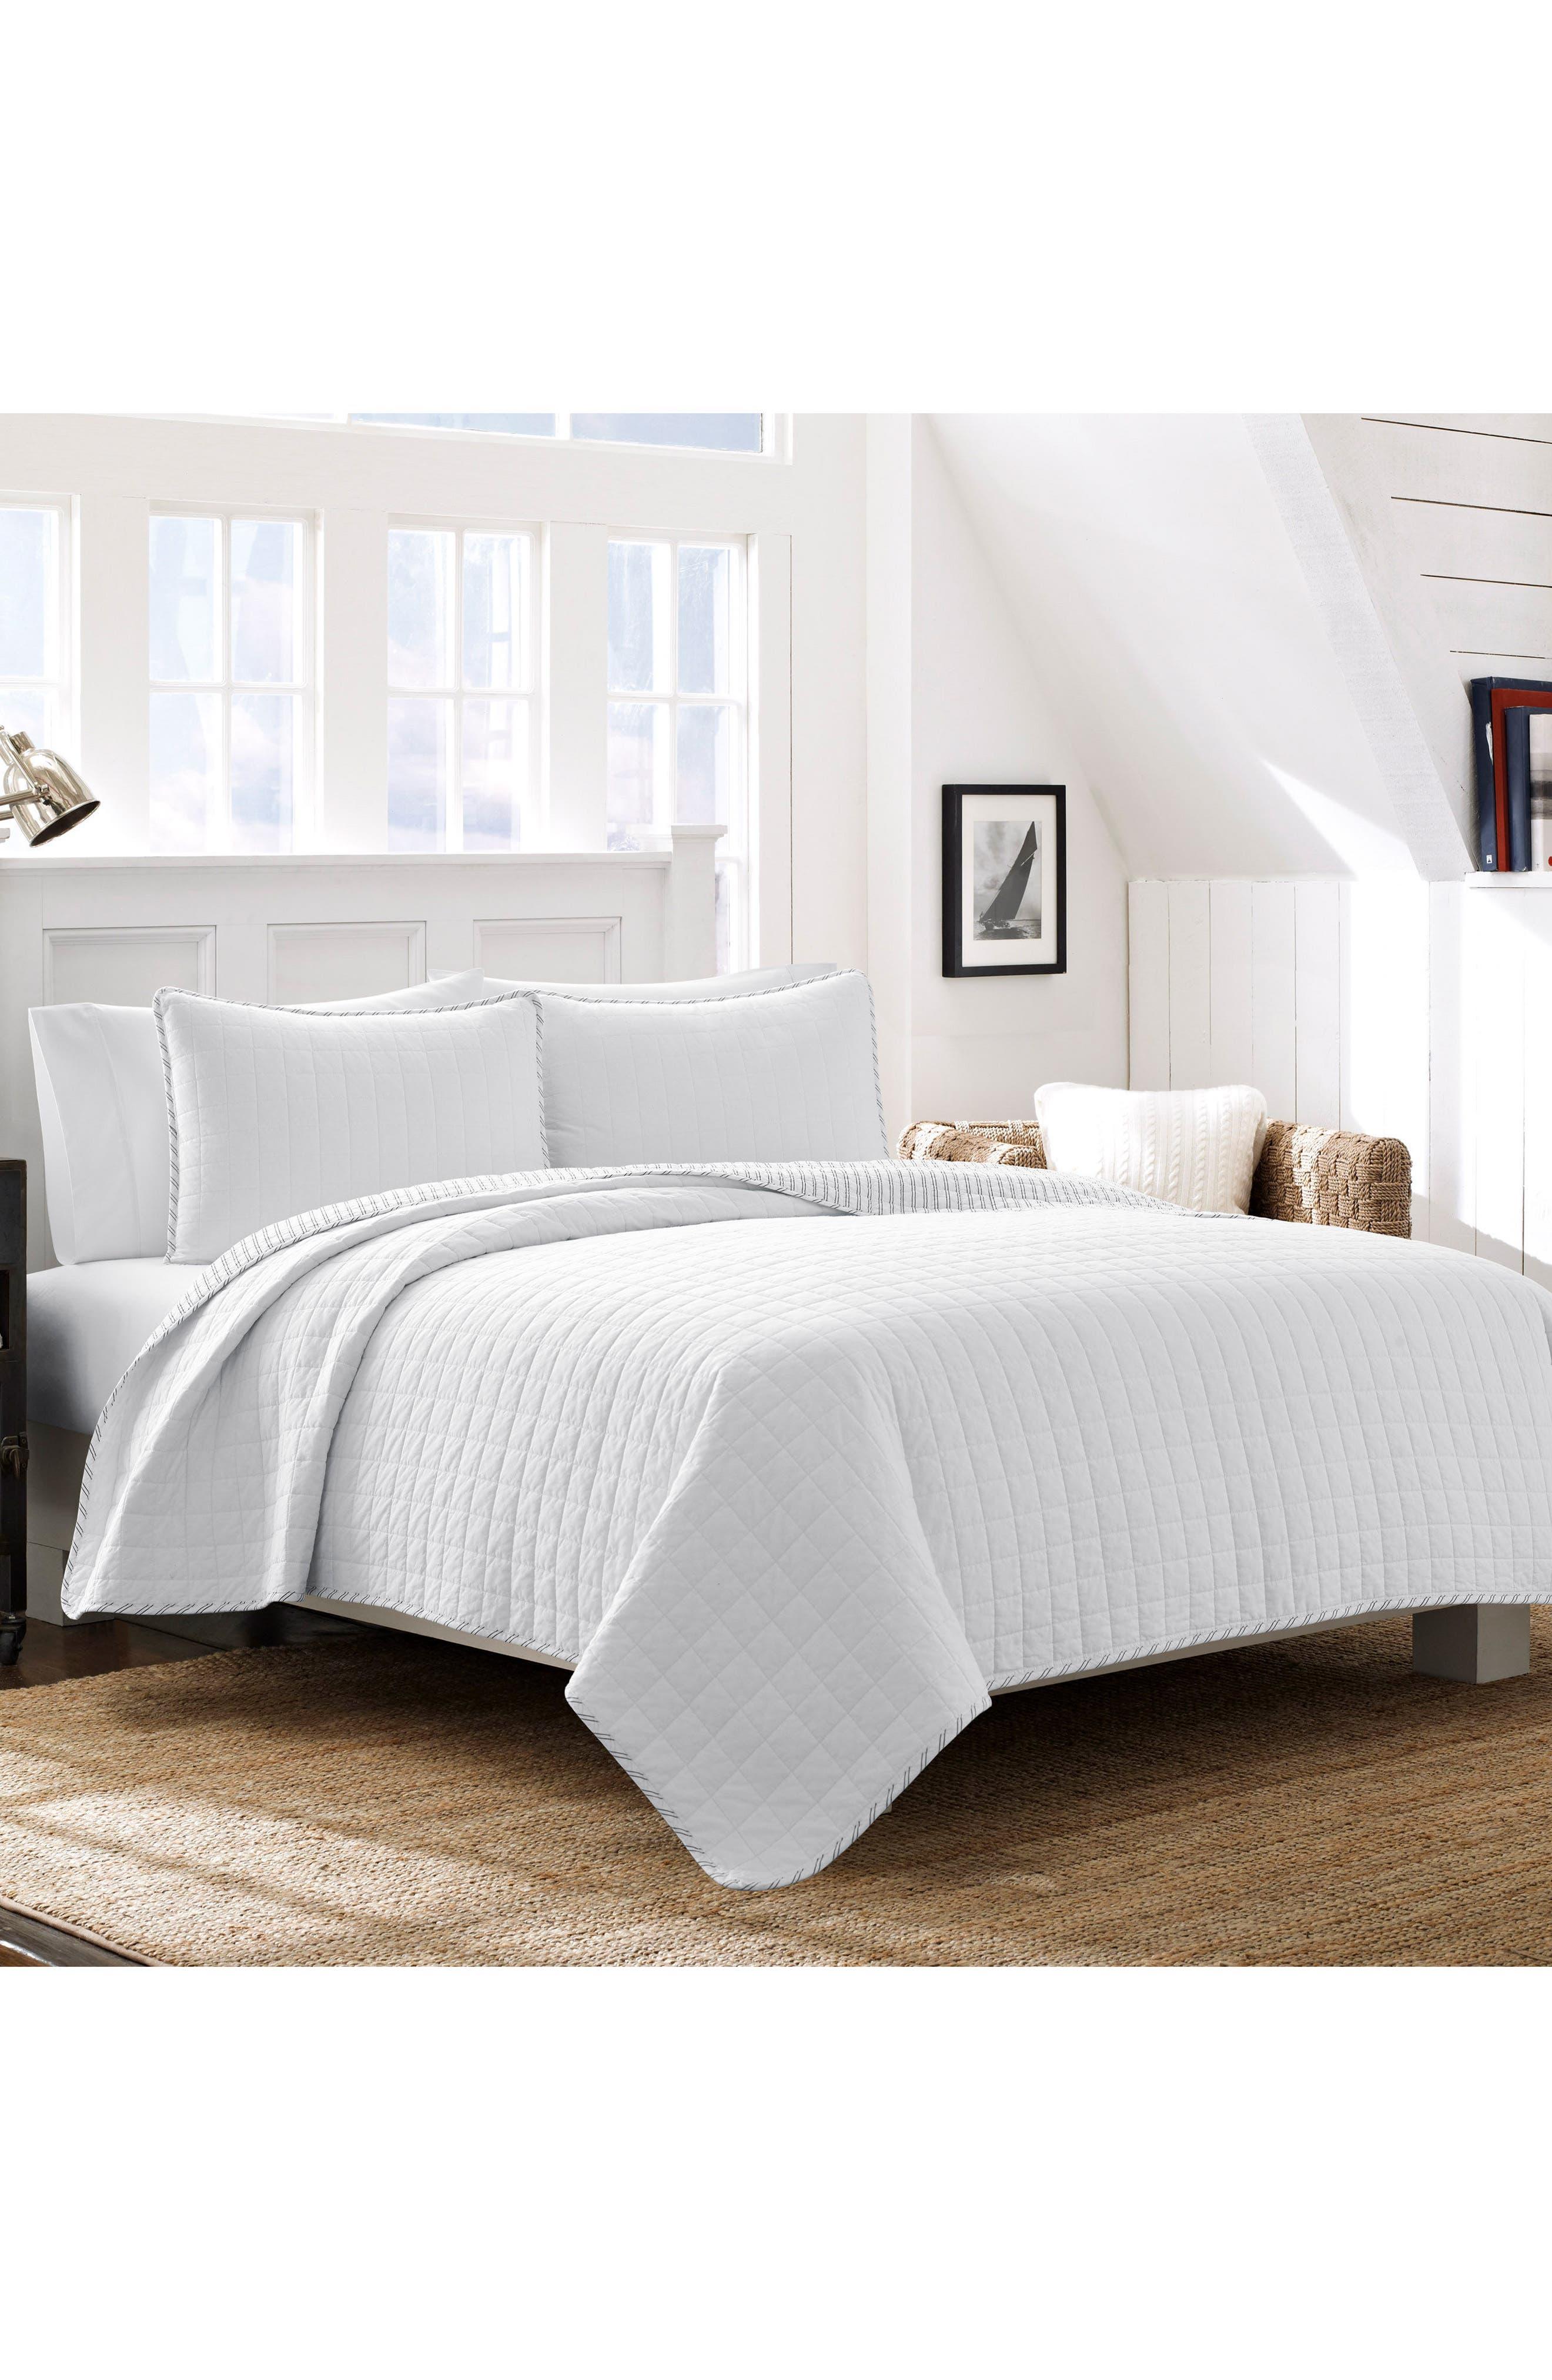 Maywood Quilt & Sham Set,                         Main,                         color, WHITE